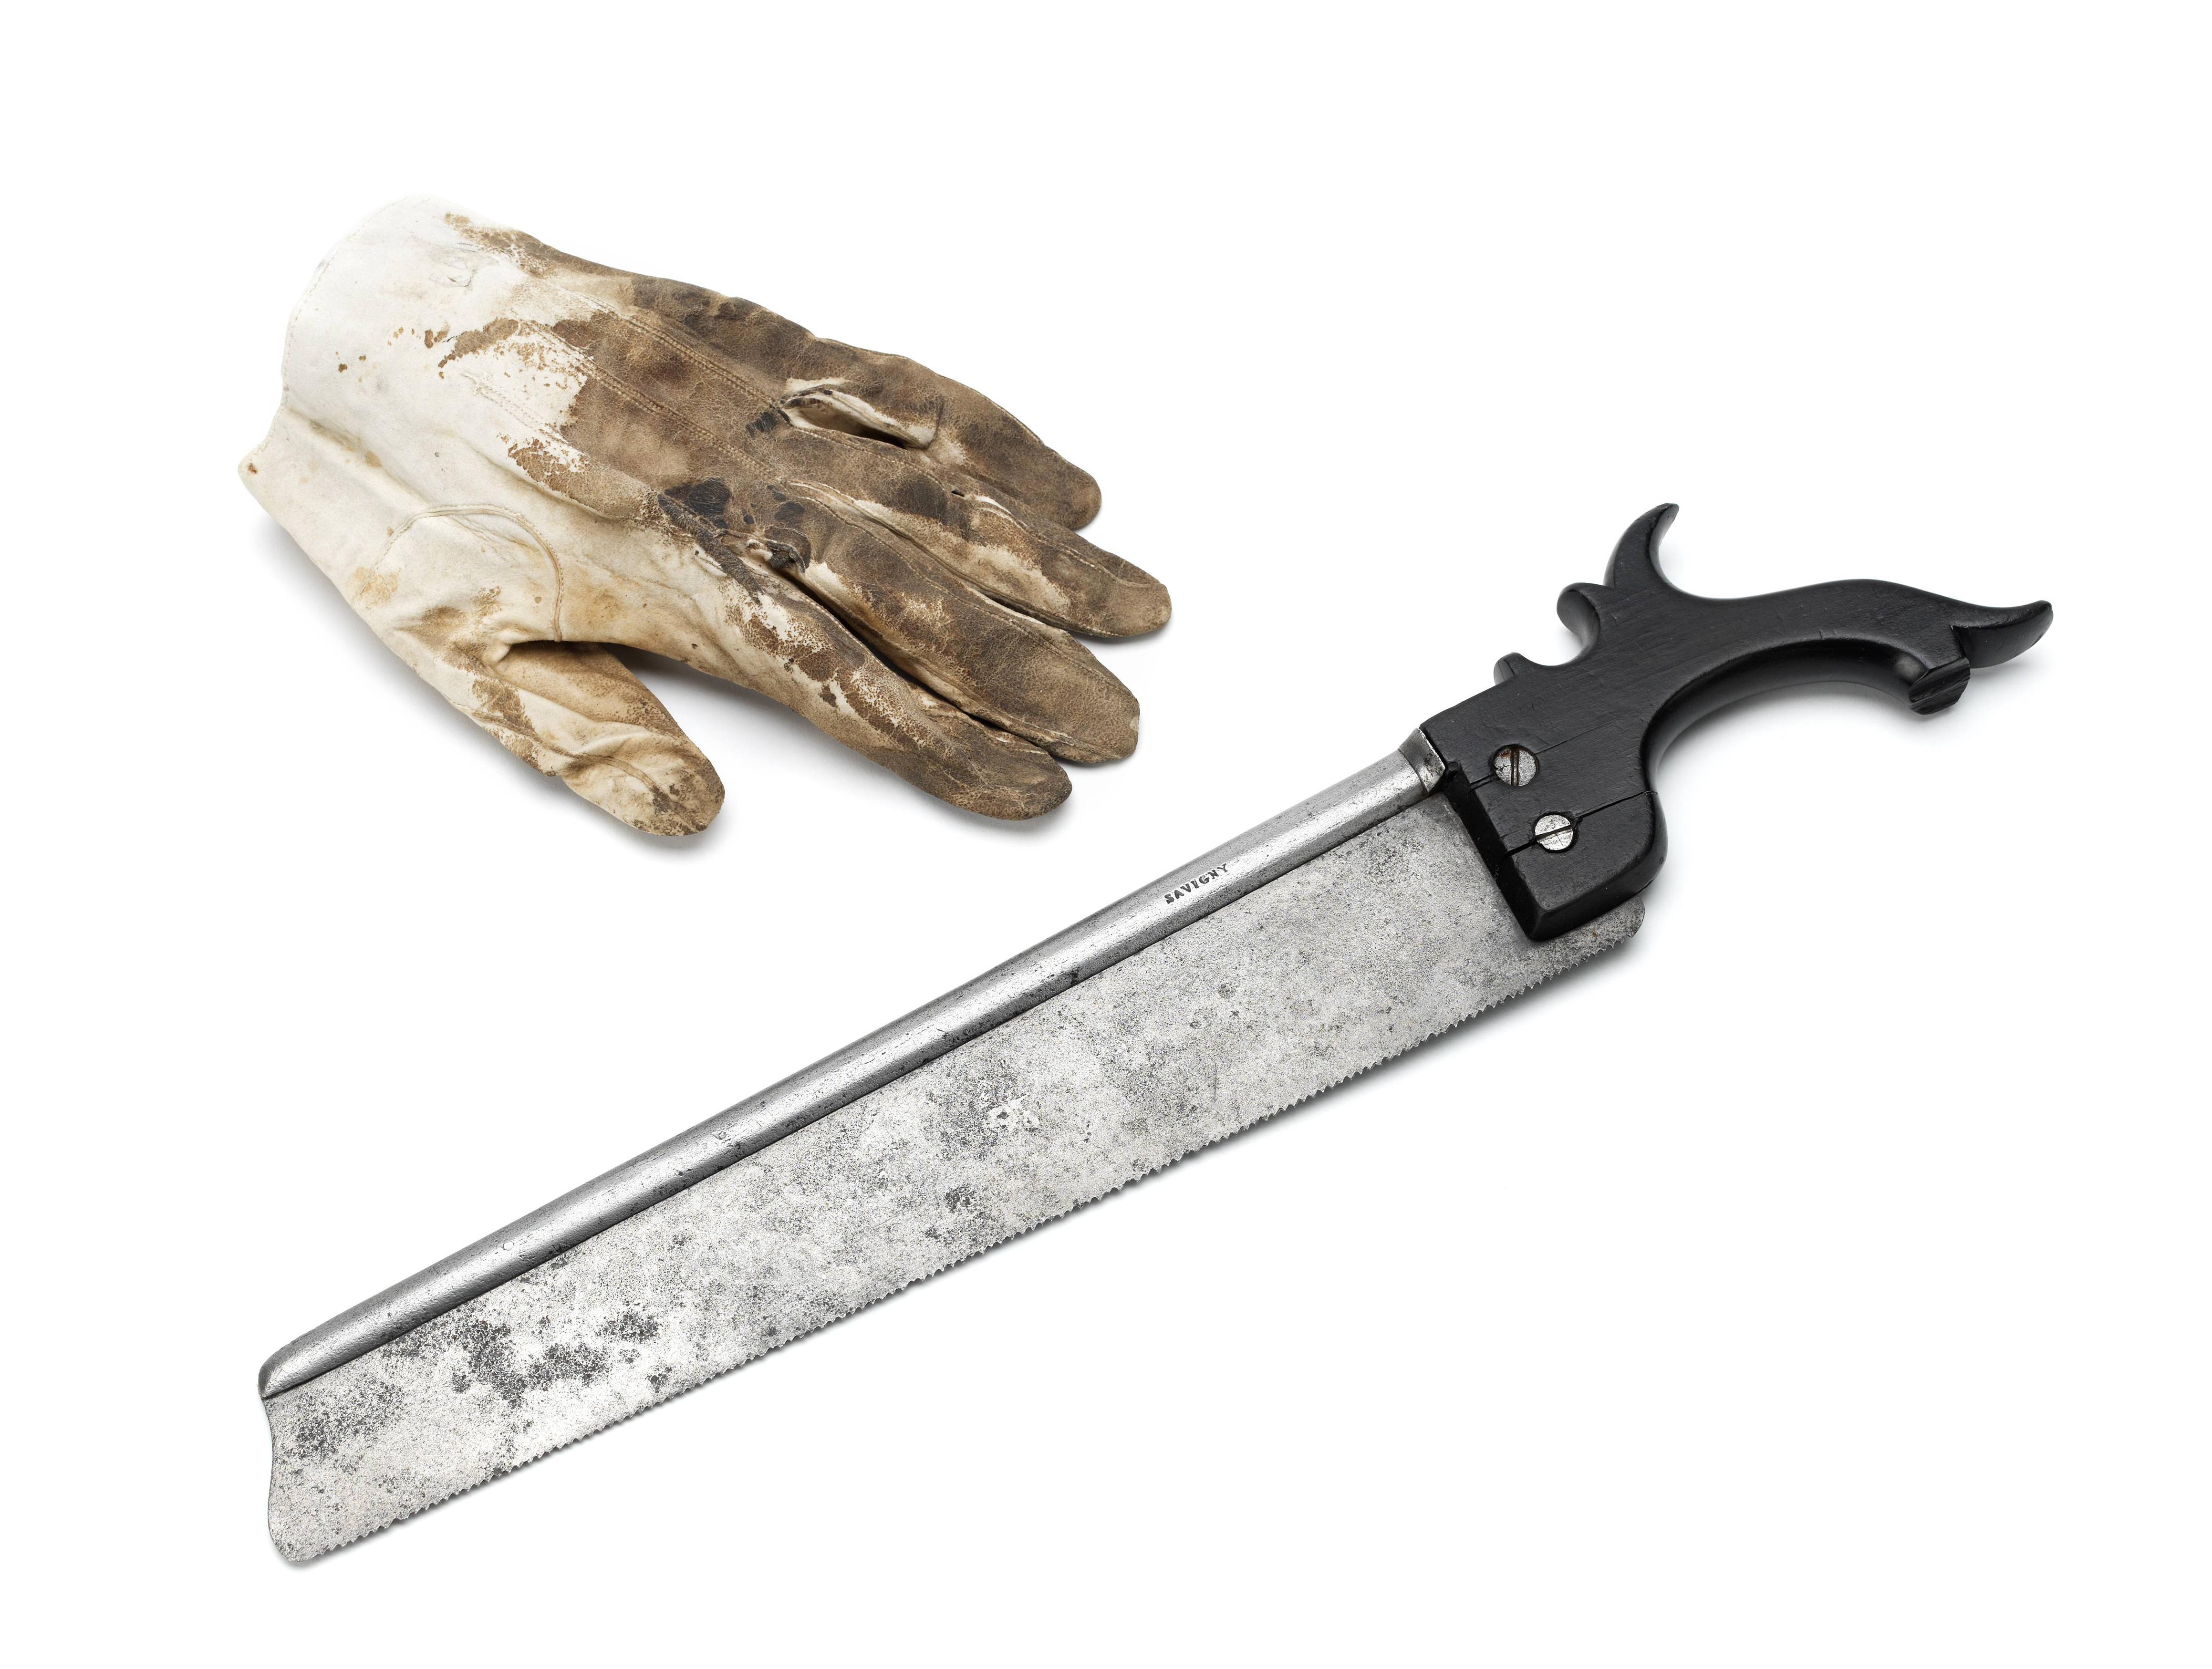 Saw and glove used to amputate Uxbridge's leg